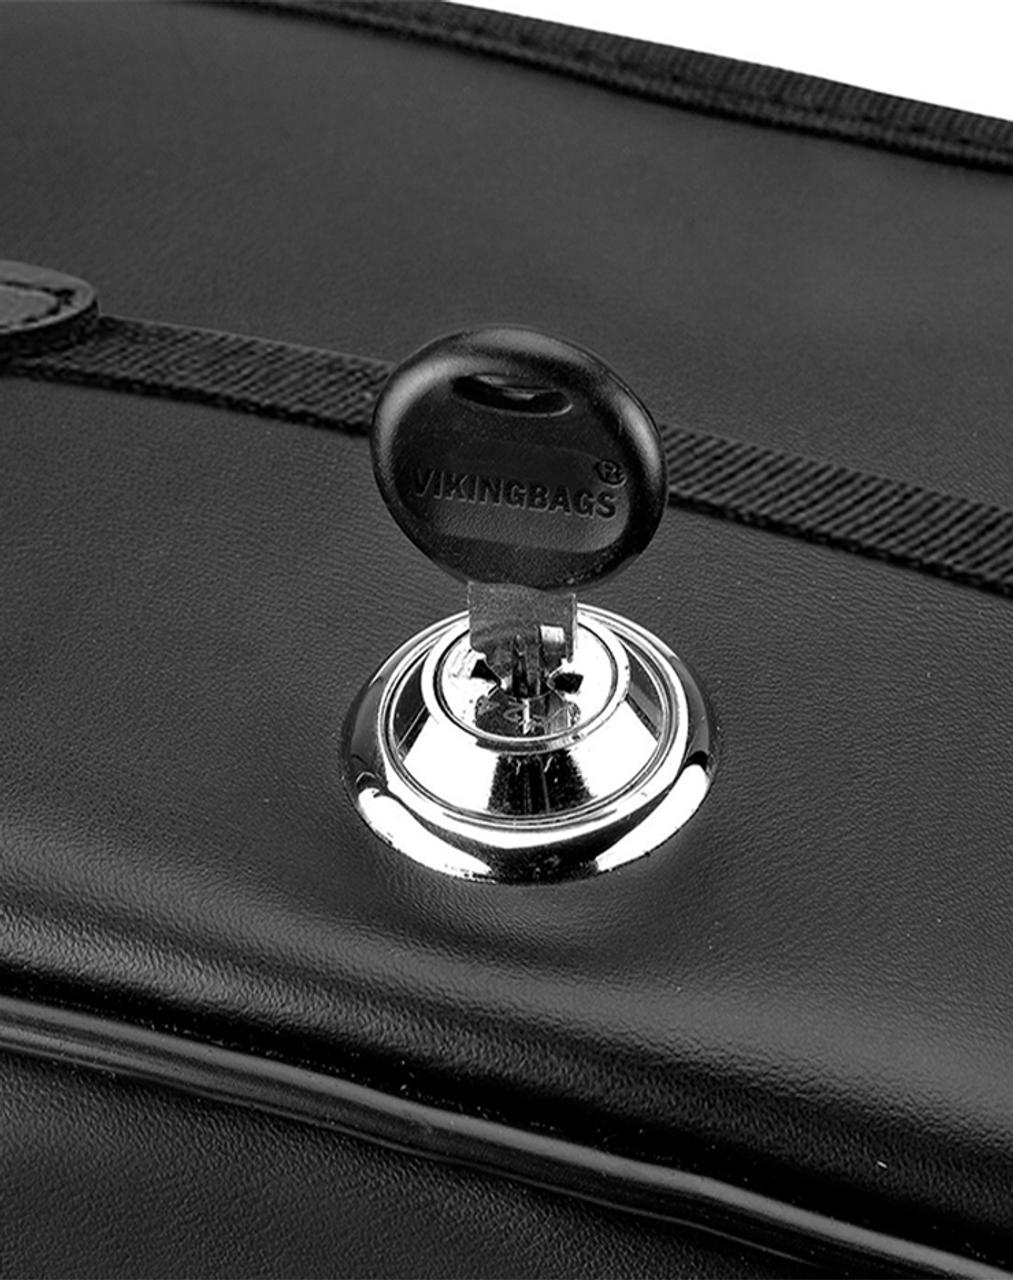 Yamaha Silverado Ultimate Large Plain Motorcycle Saddlebags Key Lock View